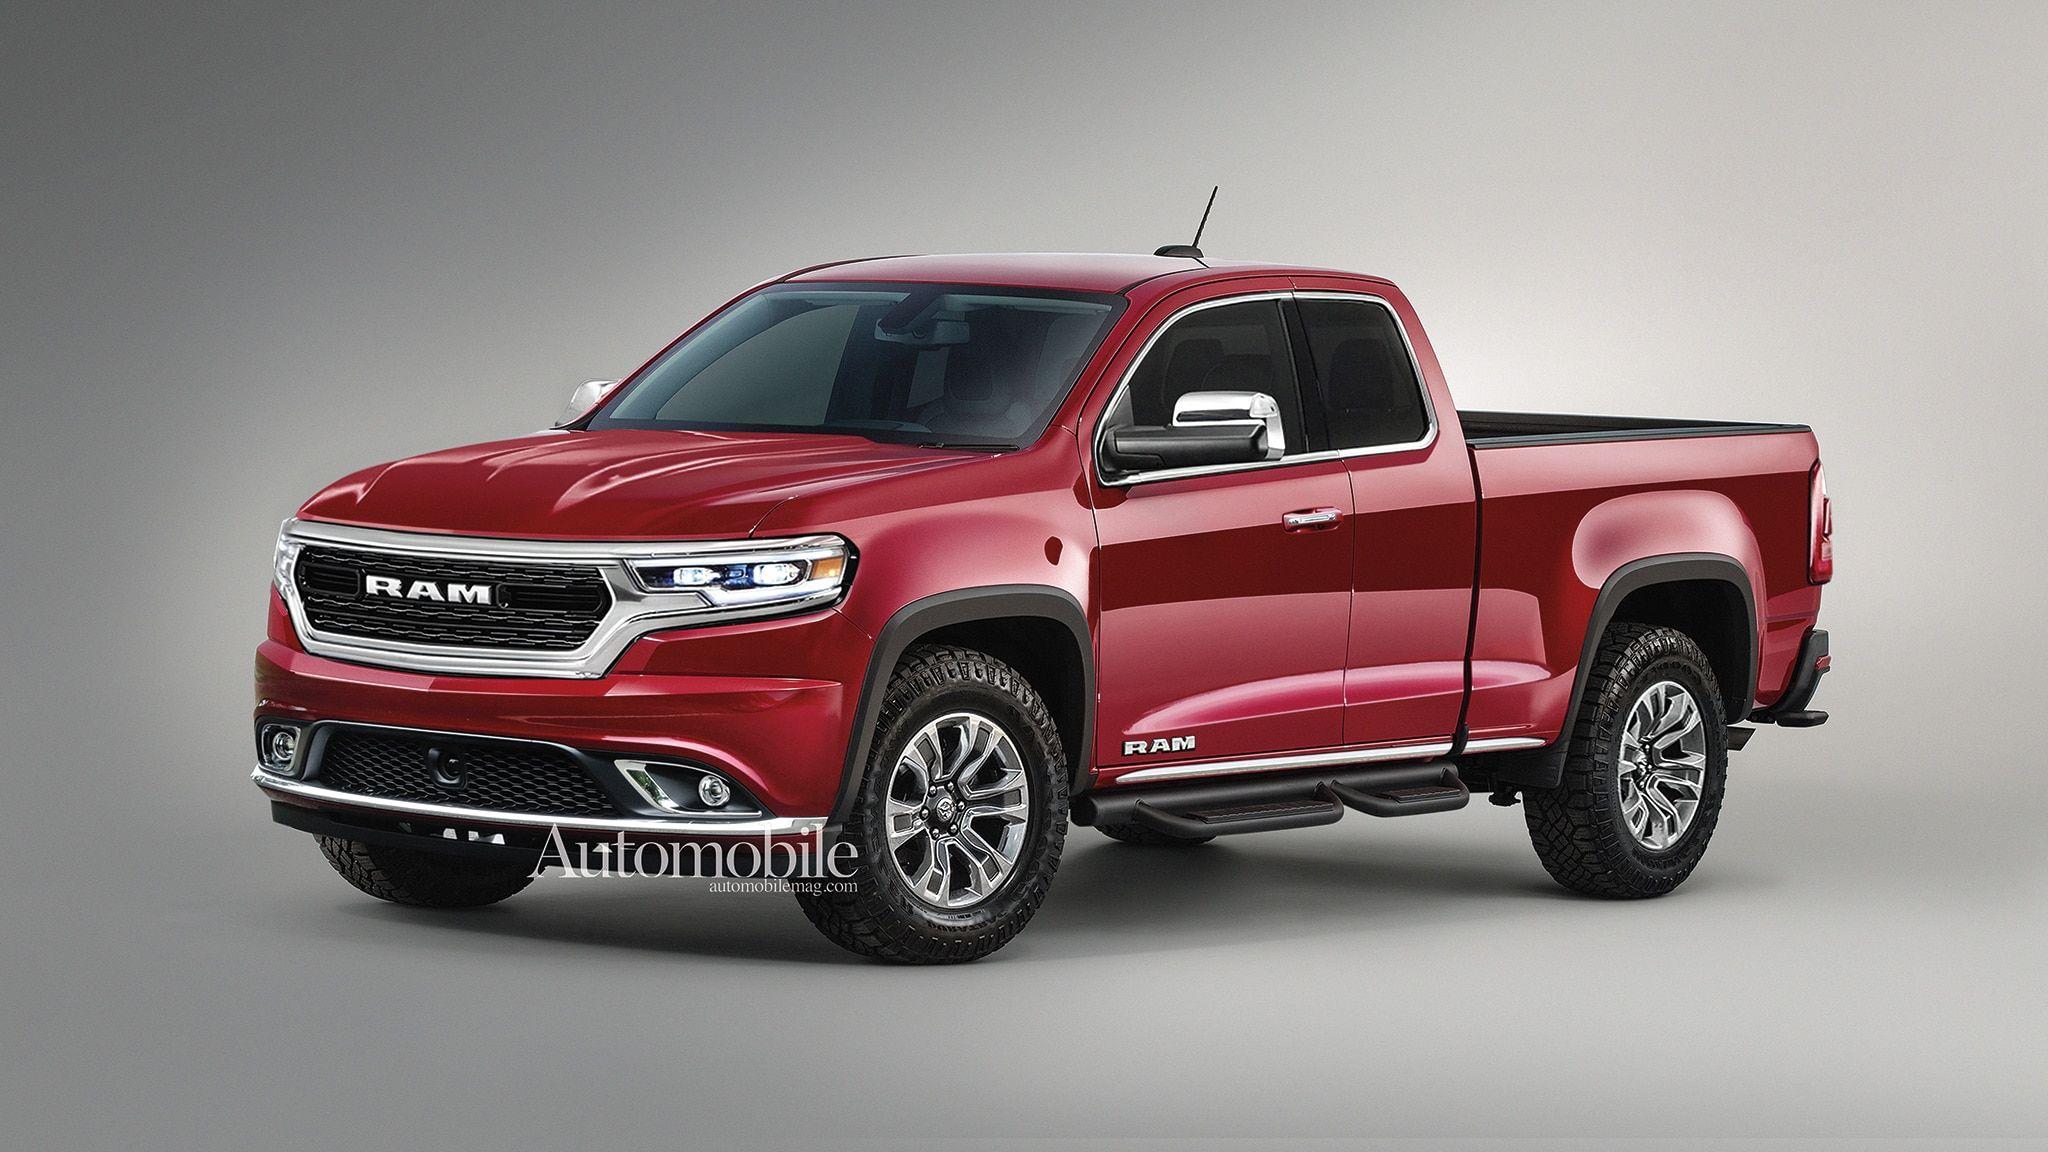 2021 Ram Dakota Midsize Pickup Truck Renderings Rumors Pickup Trucks Dodge Dakota Trucks